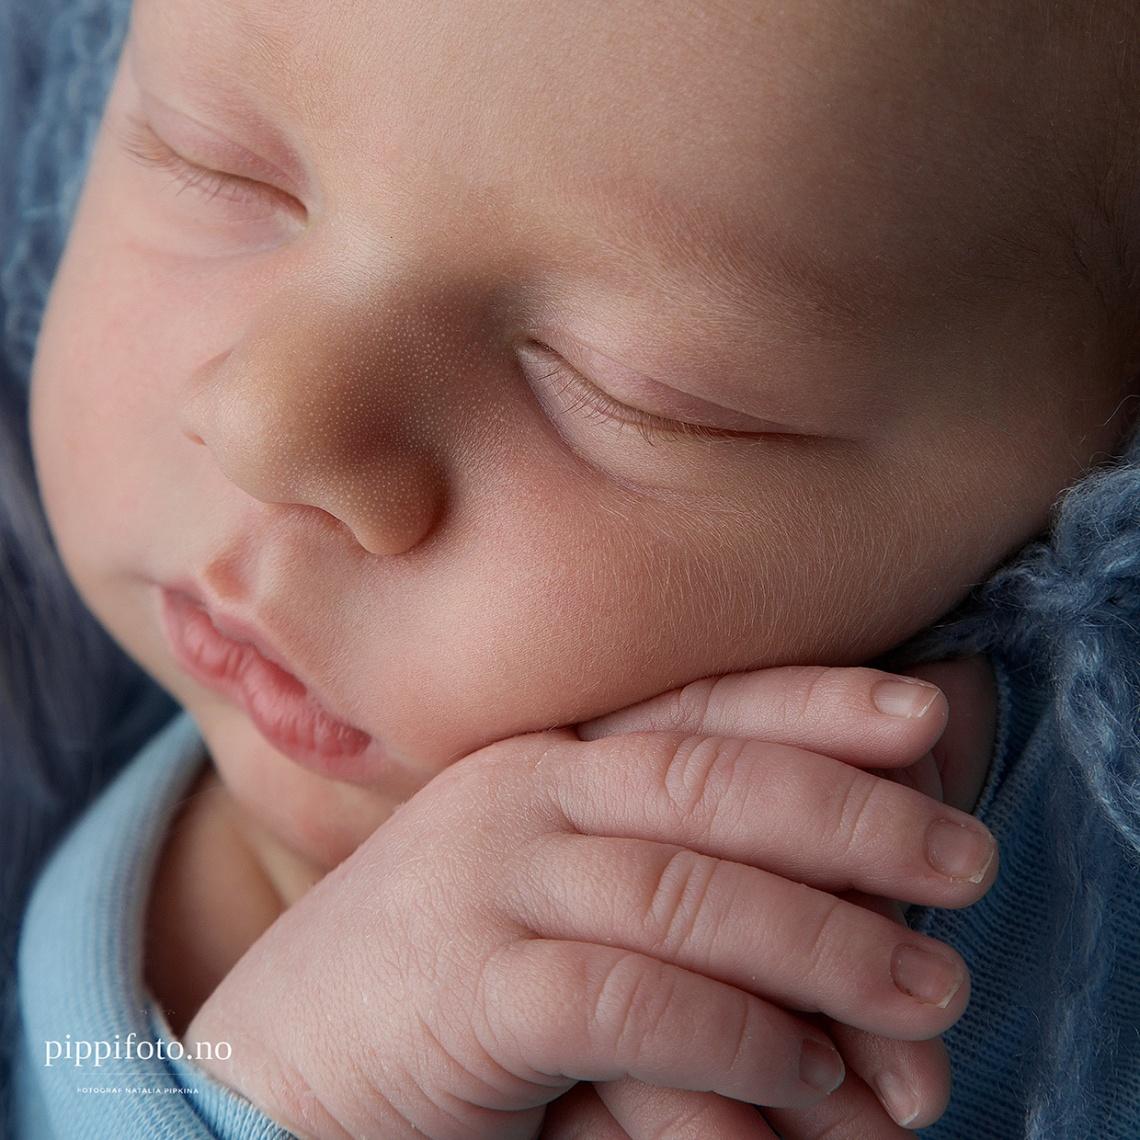 navn-til-nyfødt-gutt-nyfødtbaby-nyfødtfotografering-gravidfoto-termindato-babyfoto-follo-fotograf-venter-et-barn-familiefotografering-Oslo